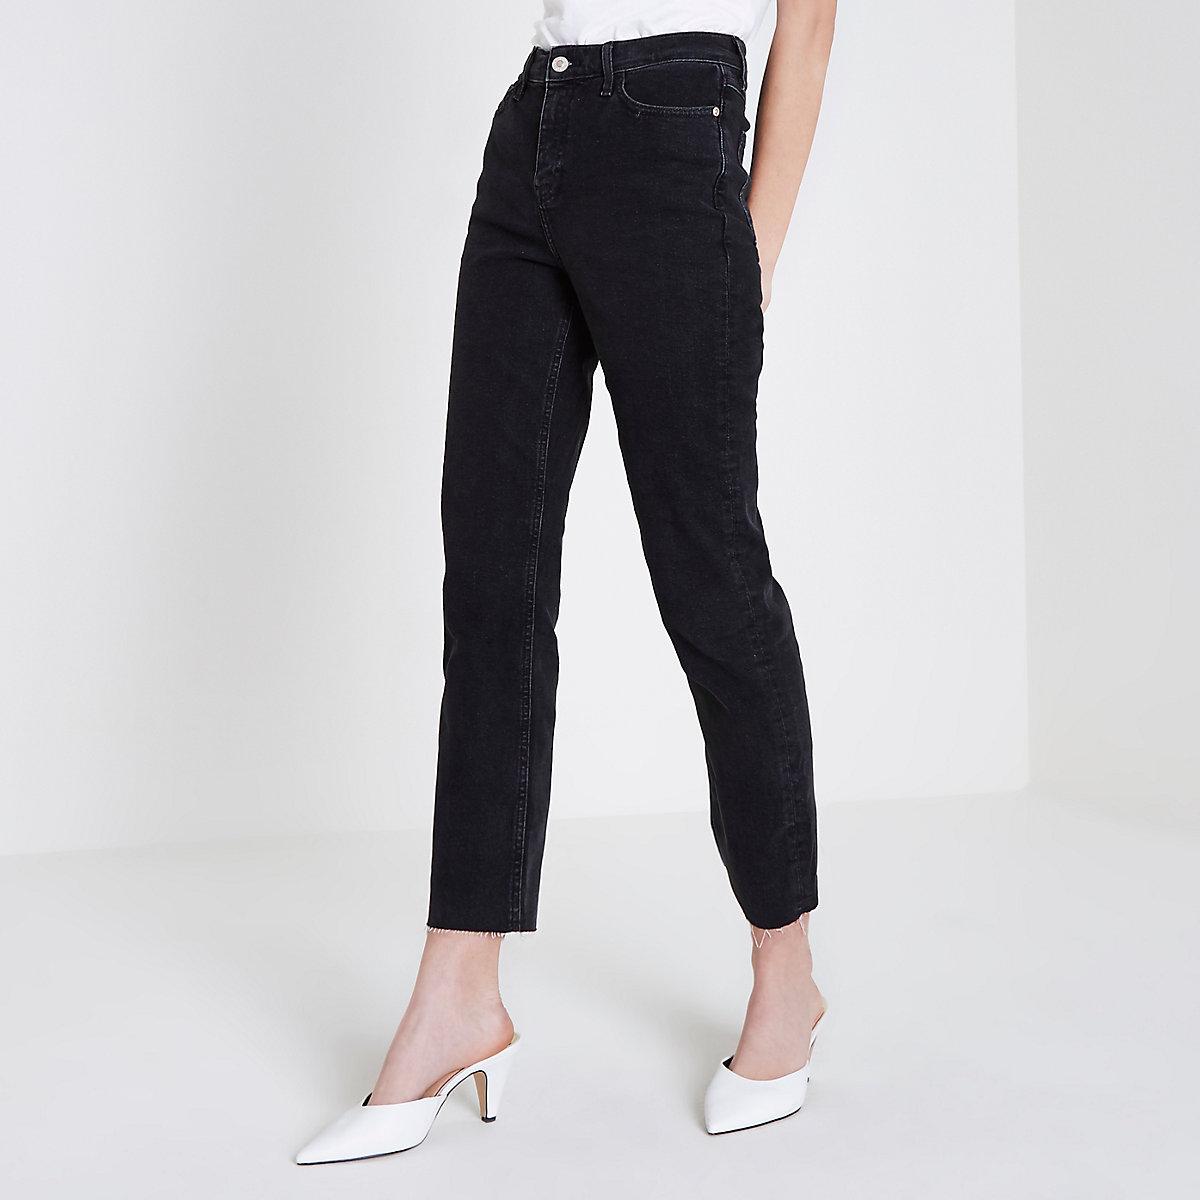 Black Bella straight leg jeans